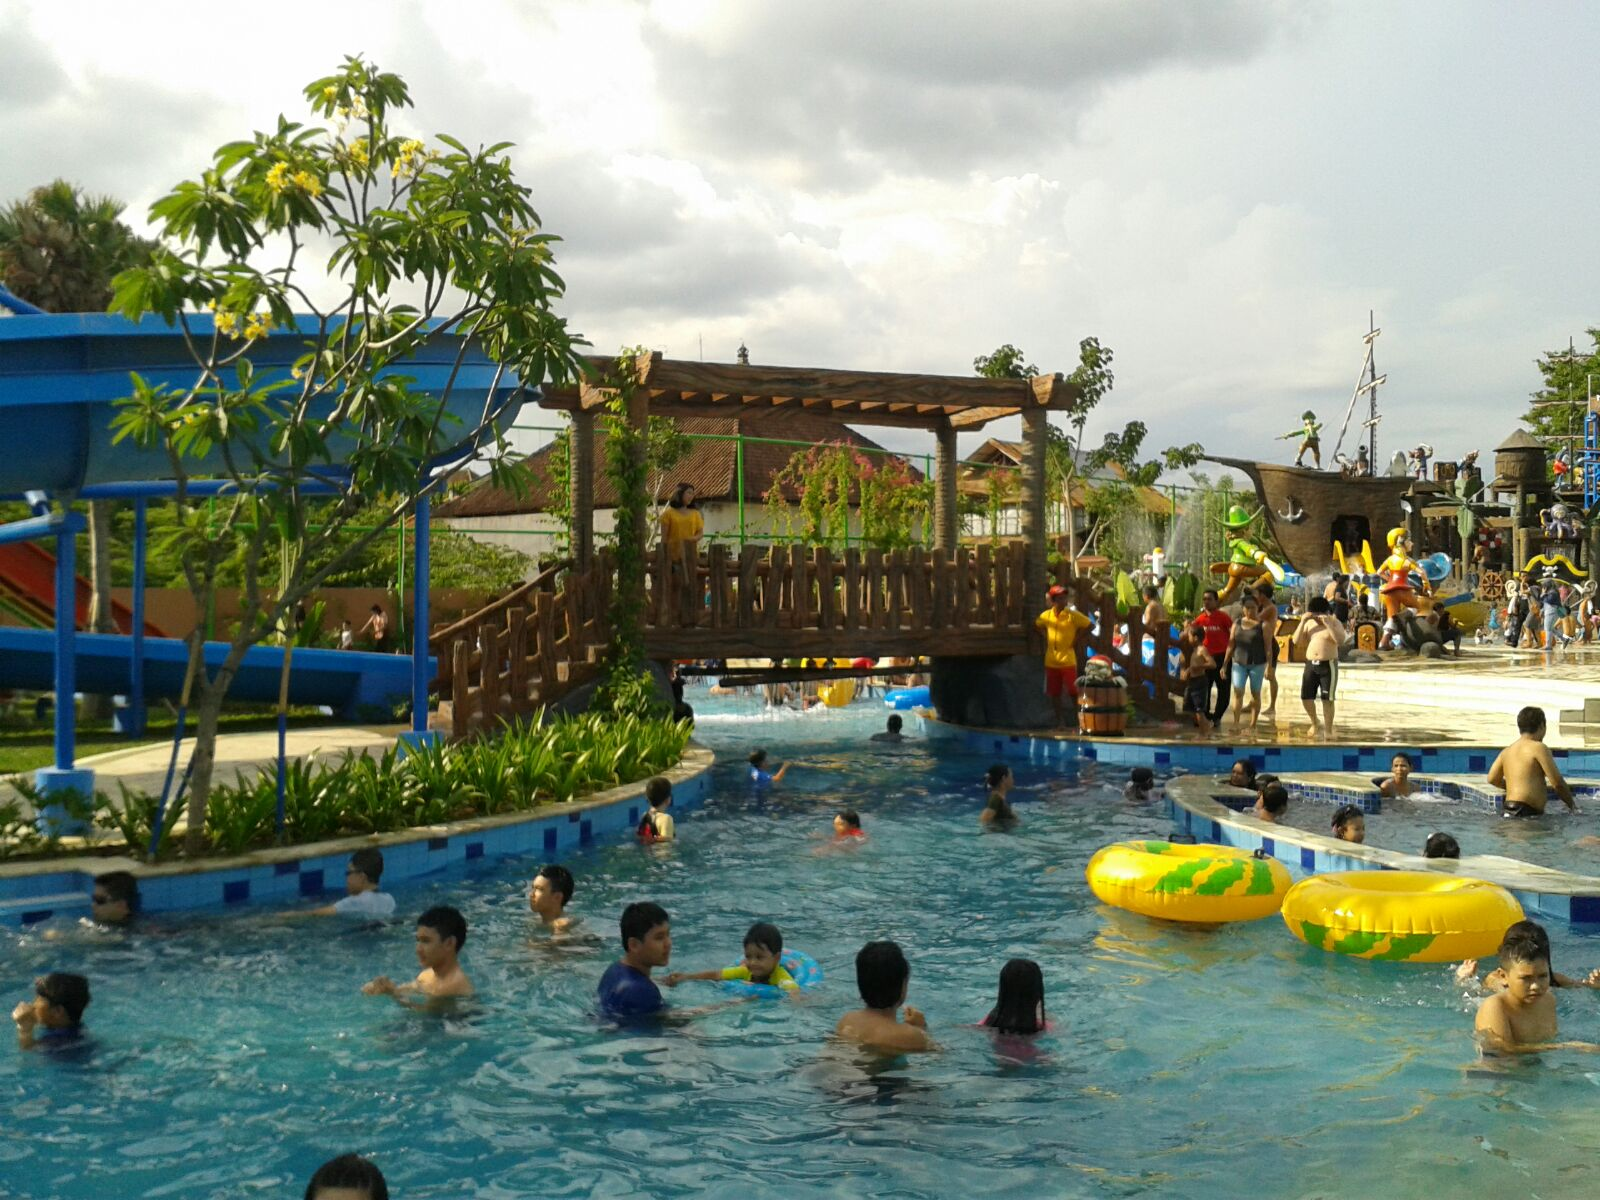 Harga Tiket Citraland Waterpark Denpasar Bali Kolam Renang Suasnaa Sekitar